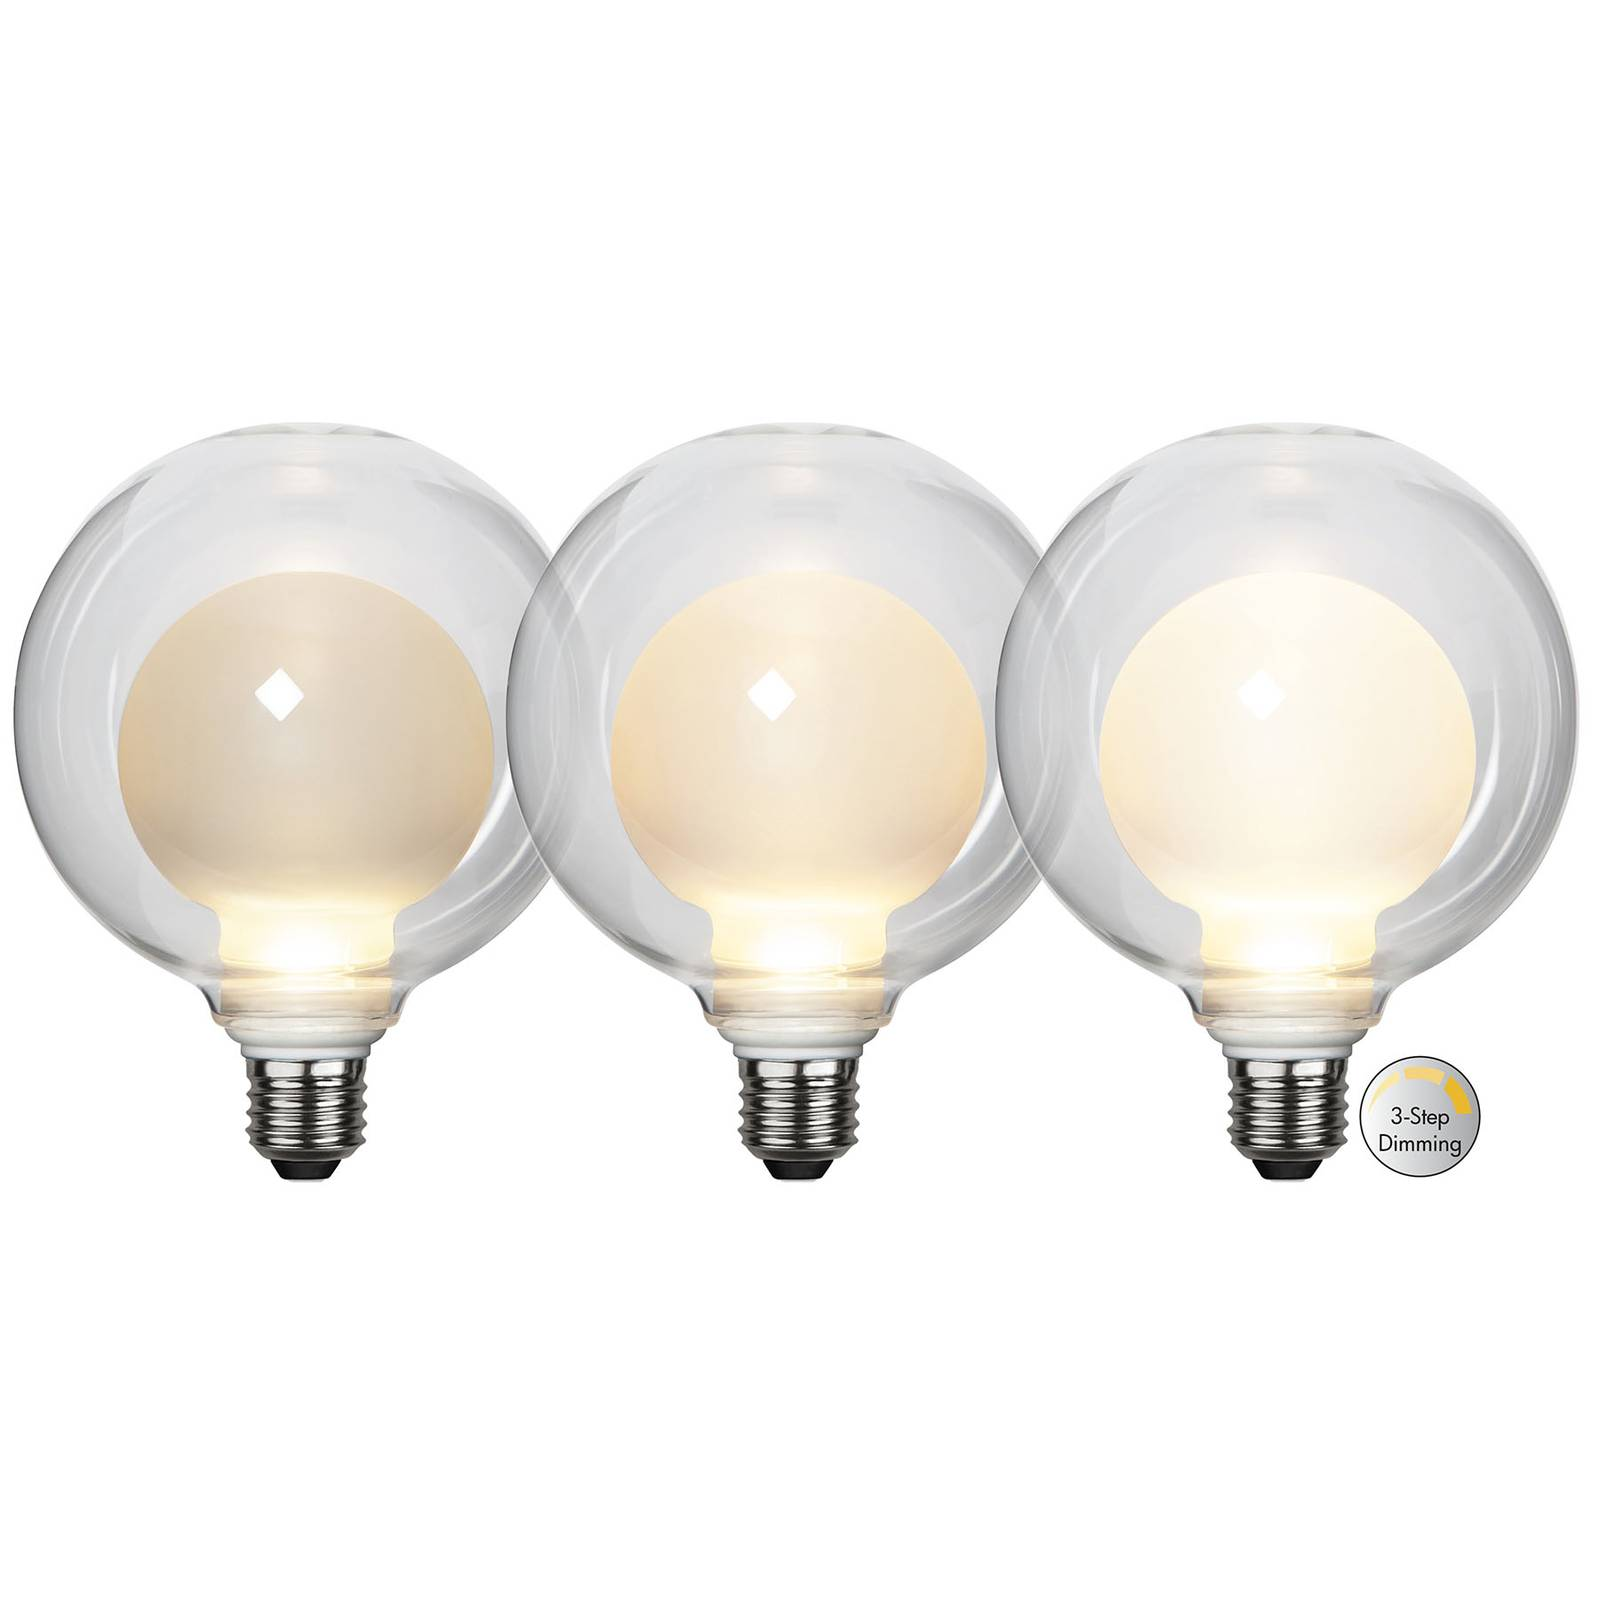 LED-lamppu Space E27 3,5W D125, opaali, 3-step dim